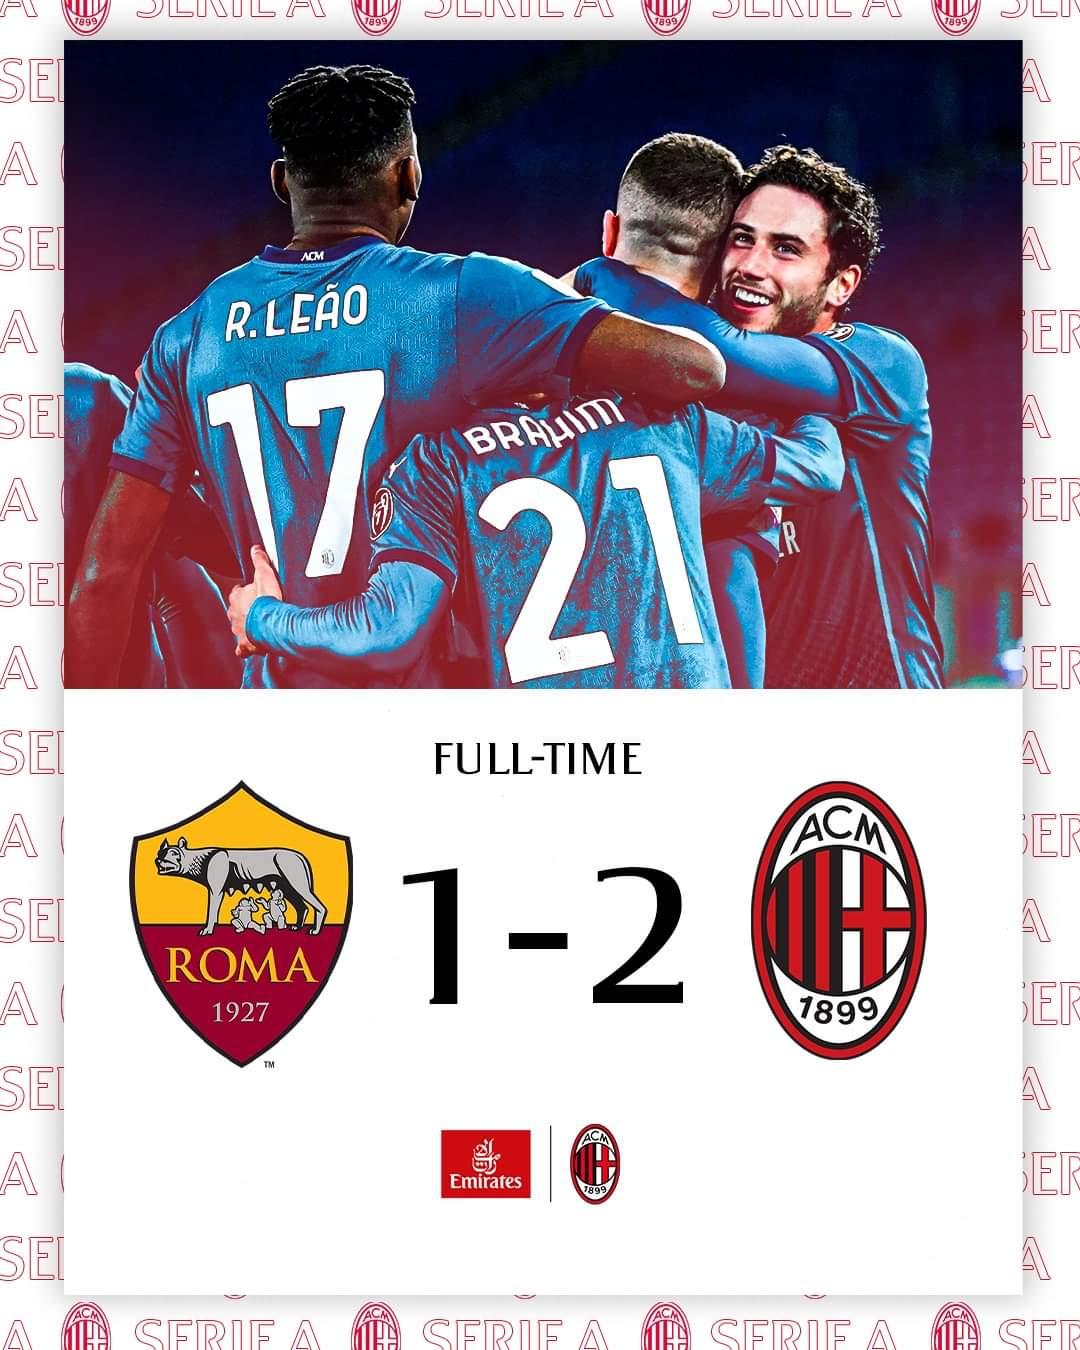 Serie A, il Milan espugna lo Stadio Olimpico